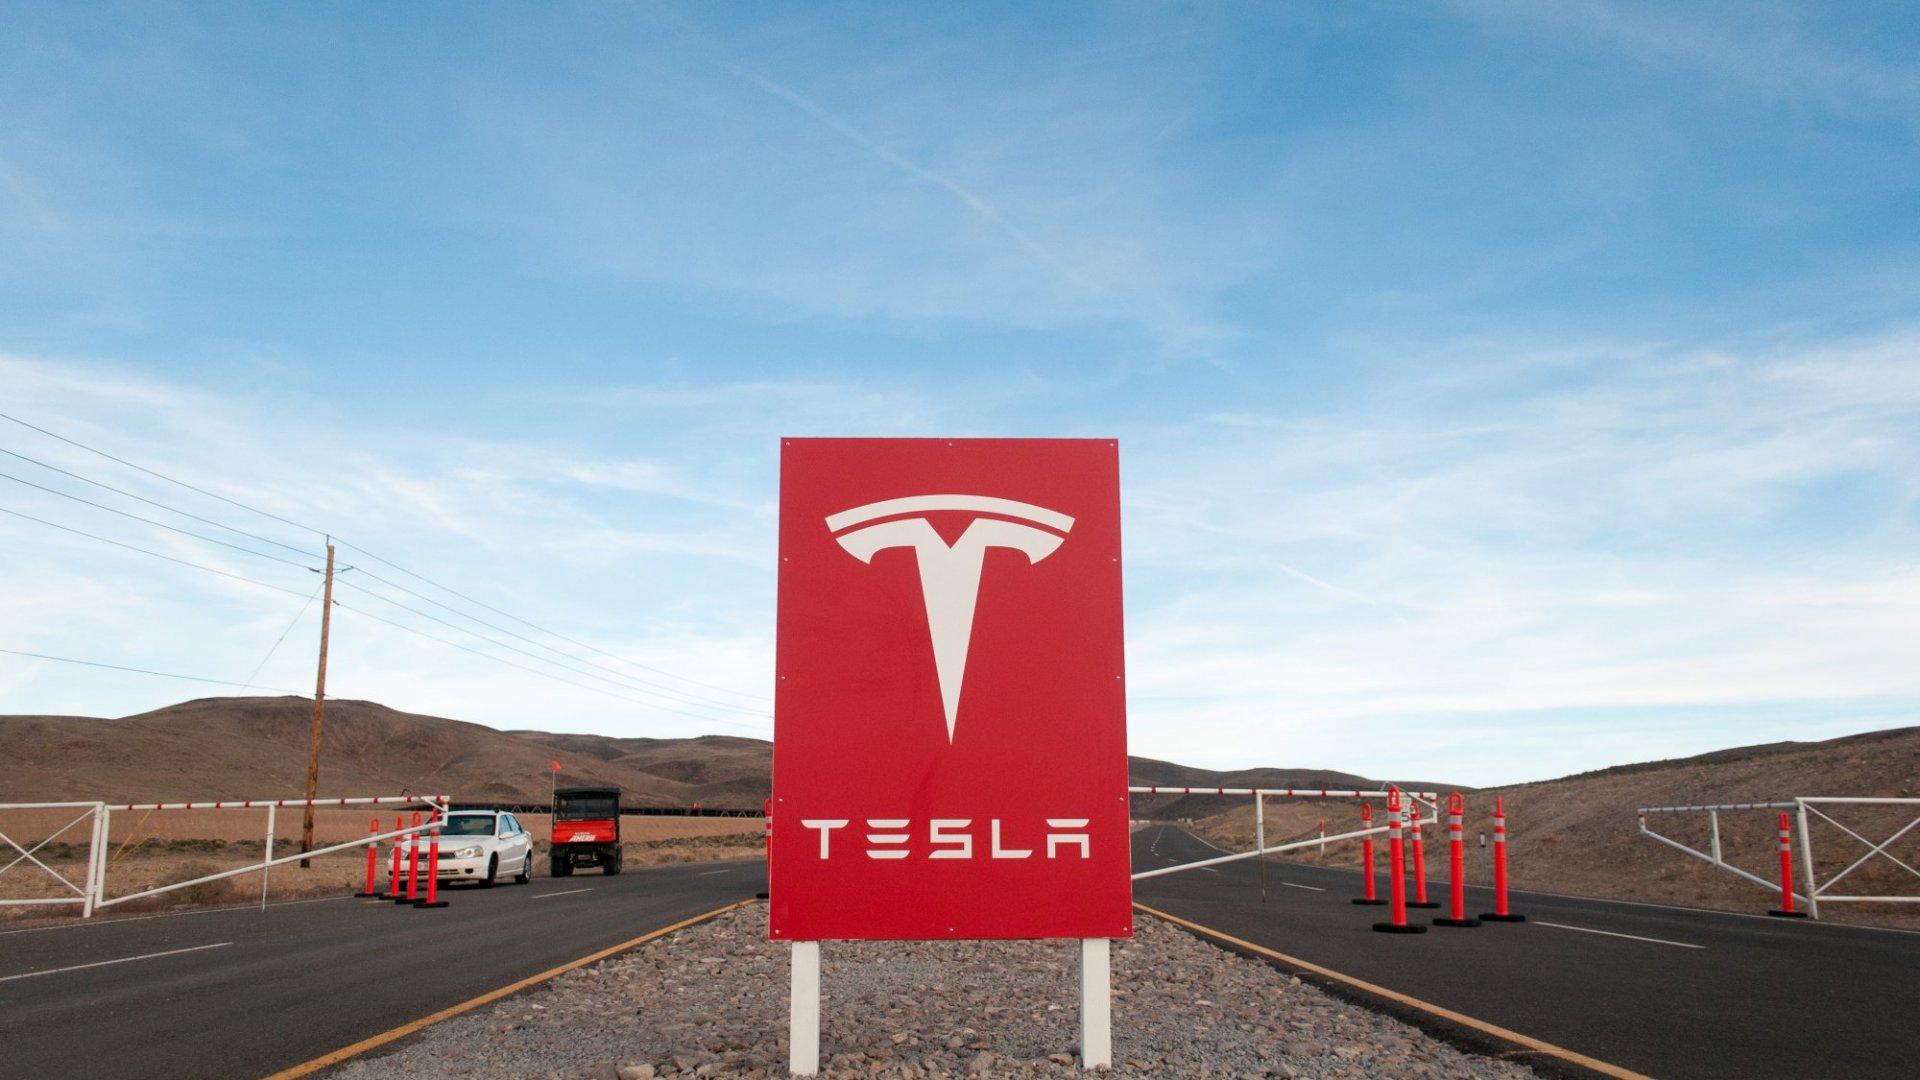 Tesla Wants to Partner With Panasonic on Solar Panels